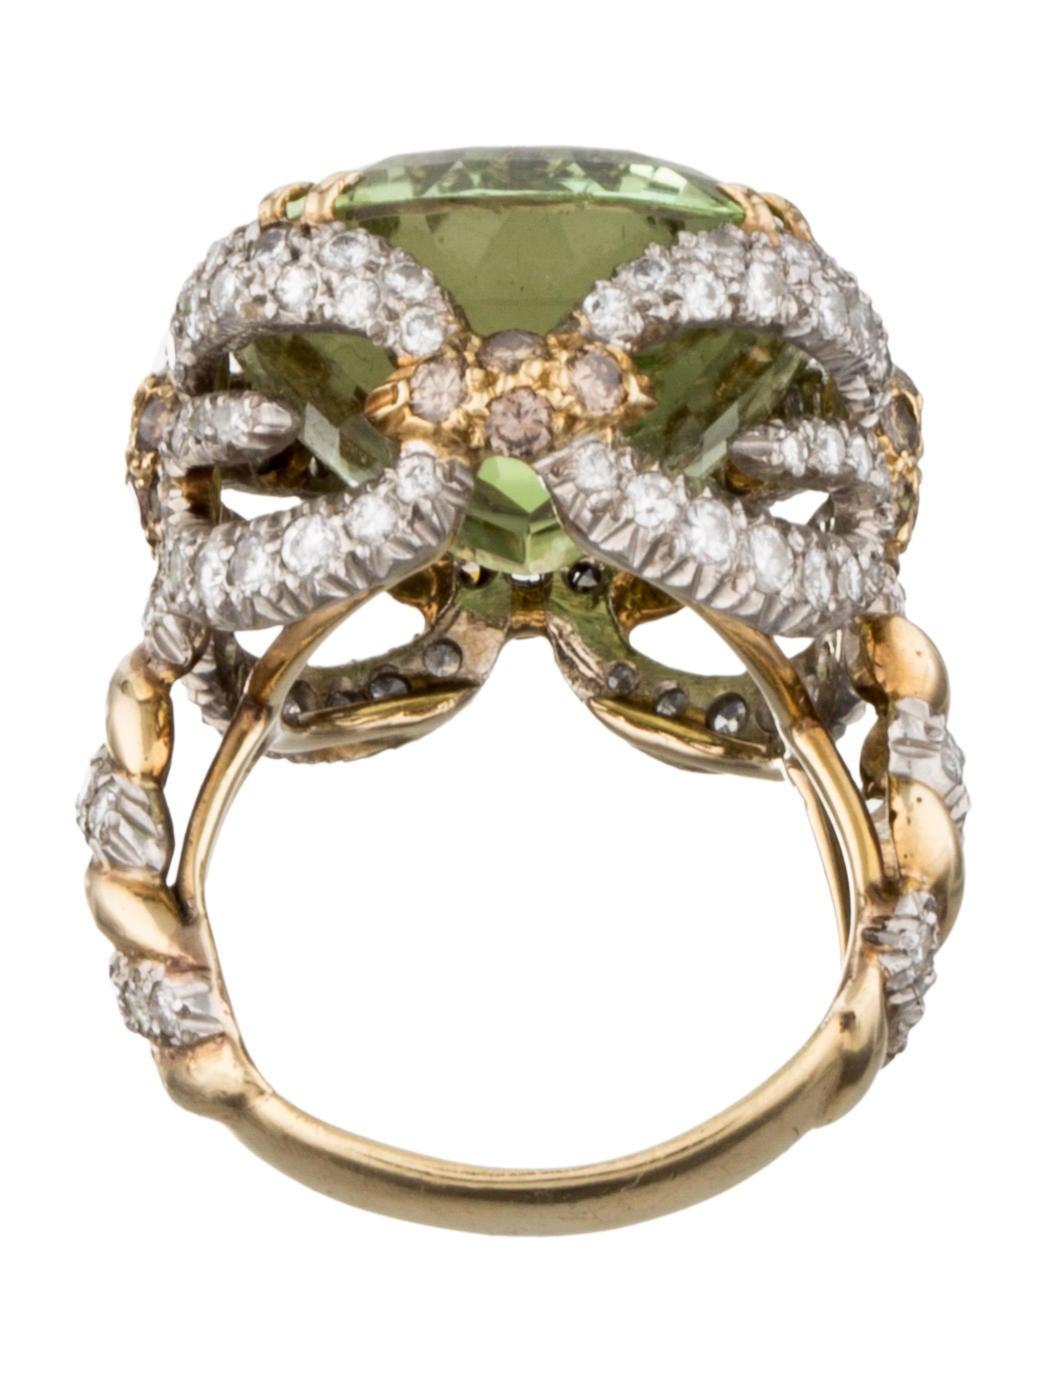 Peridot Amp Diamond Dragonfly Ring Rings Fjr26753 The